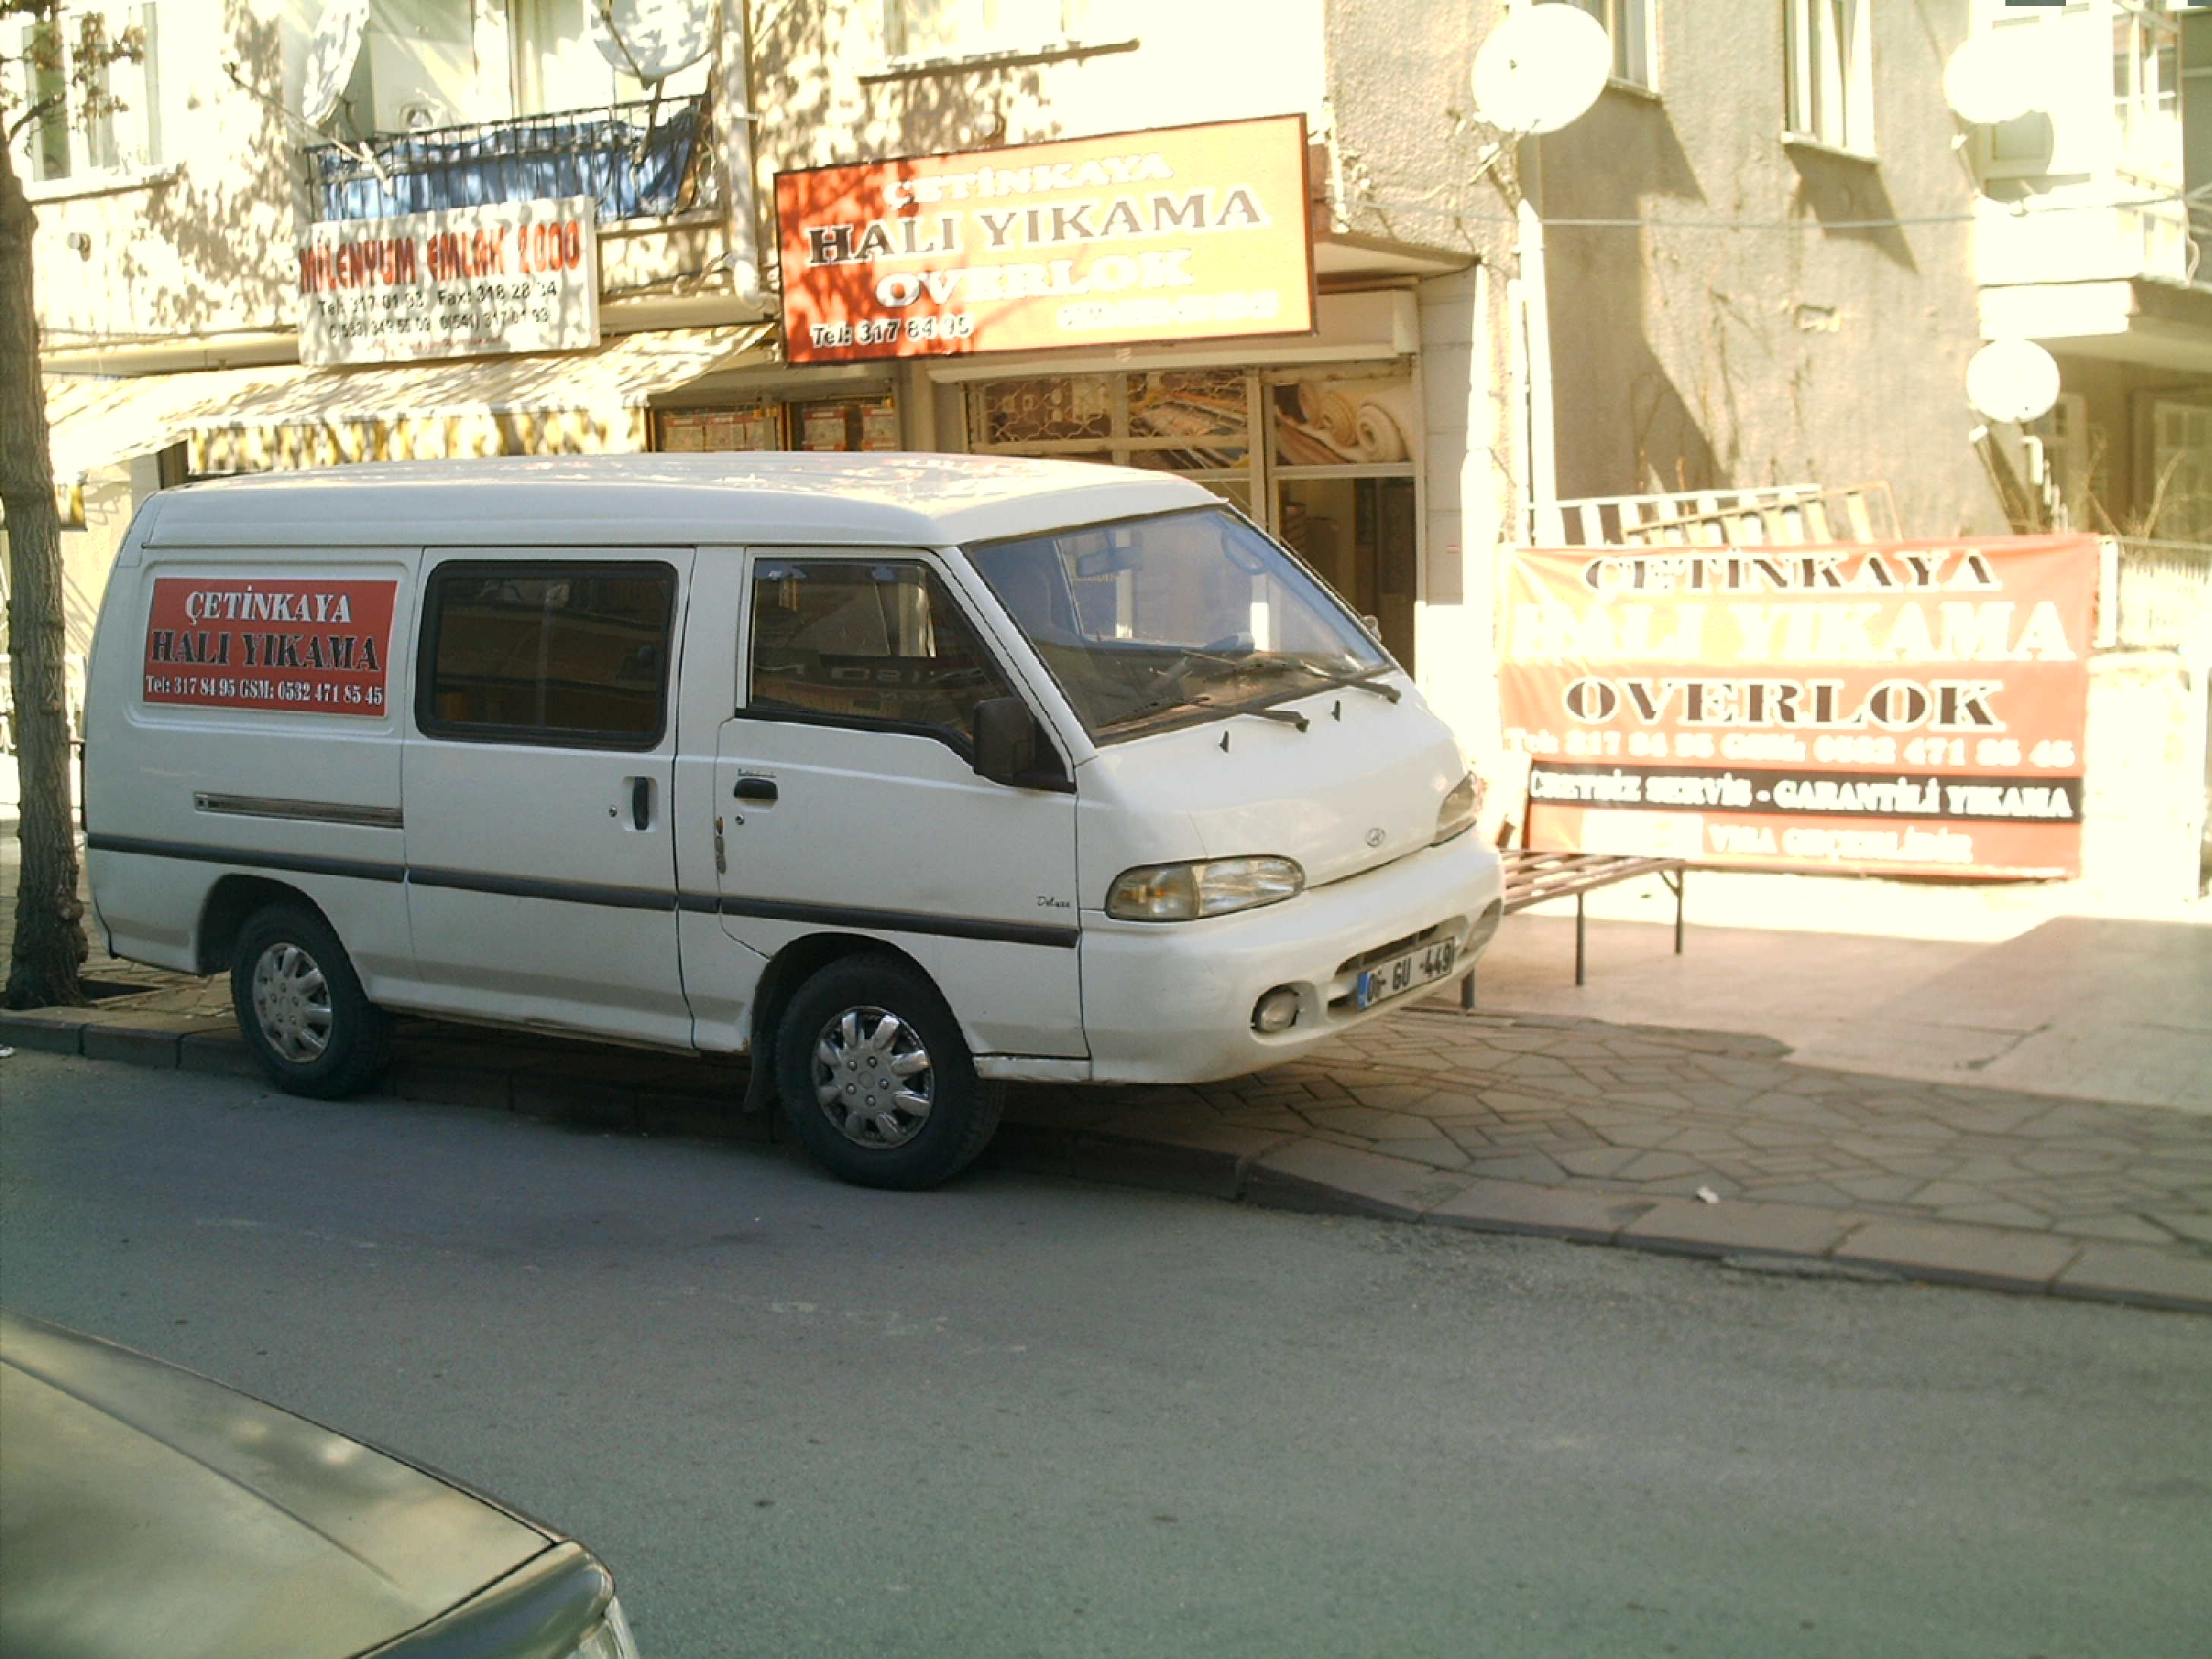 cicekli_hali_yikama_servis-1